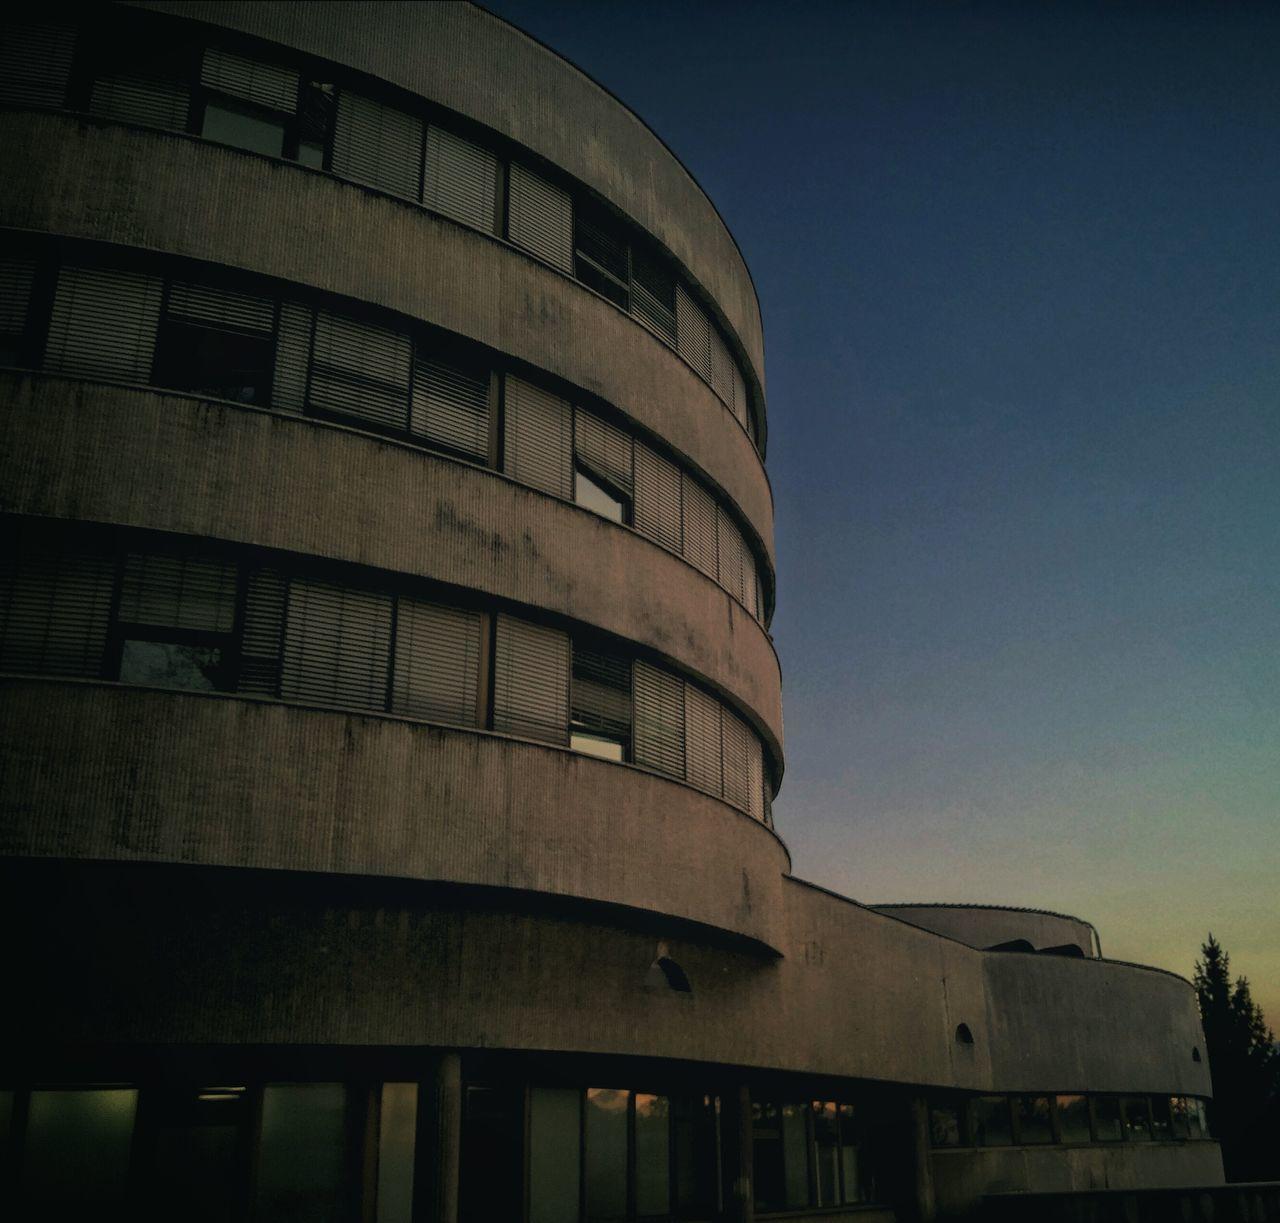 Building Sunset Sunlight Colors Silhouette Sarajevo Sarajevobosnia Bolnica Futuristic Armed